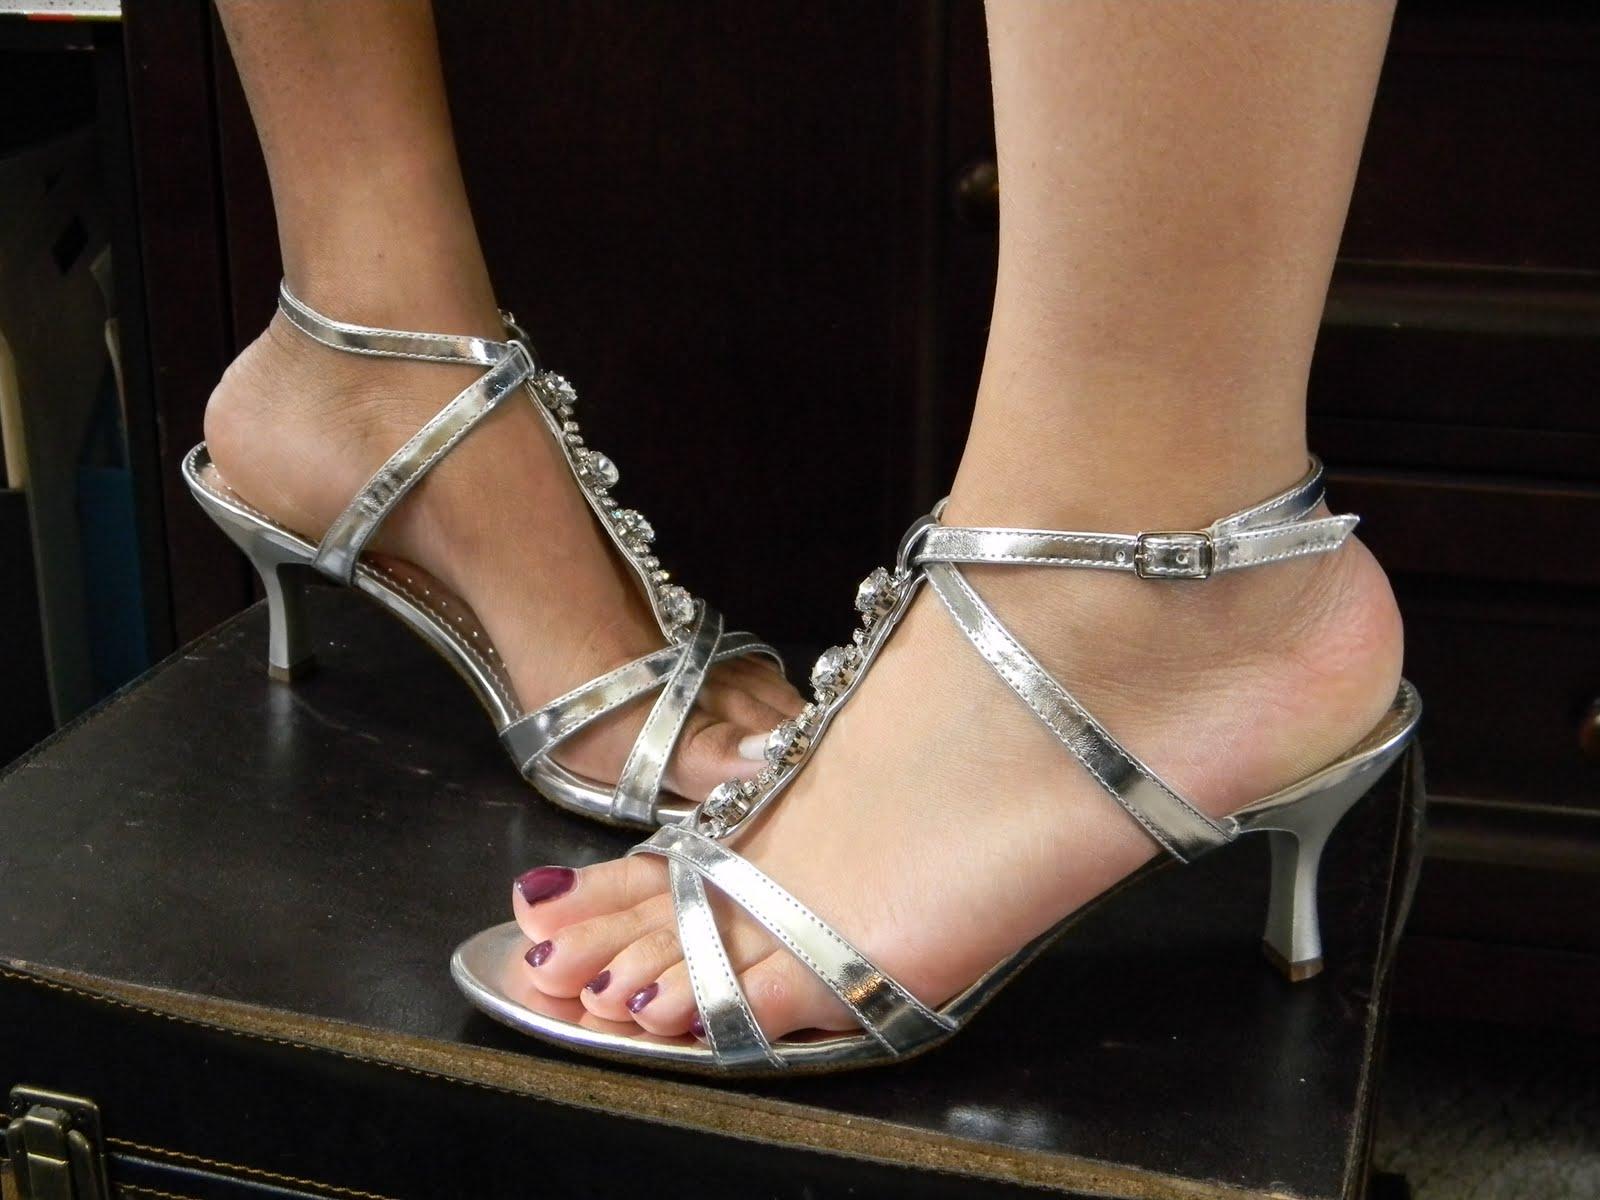 cartier mcdonald vip hostess shoes cartier mcdonald vip